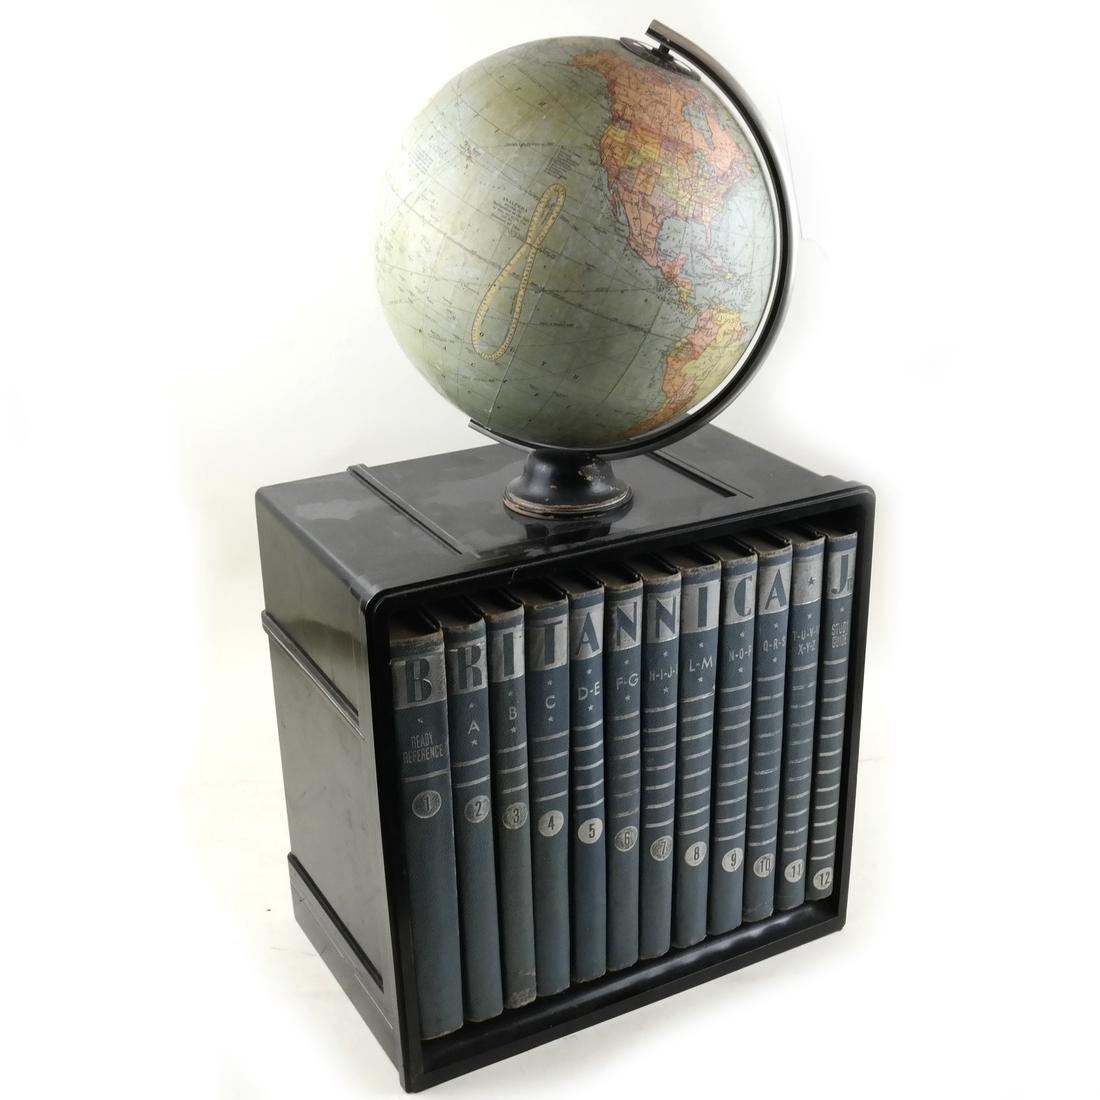 1930's Globe with Encyclopedia Britannica